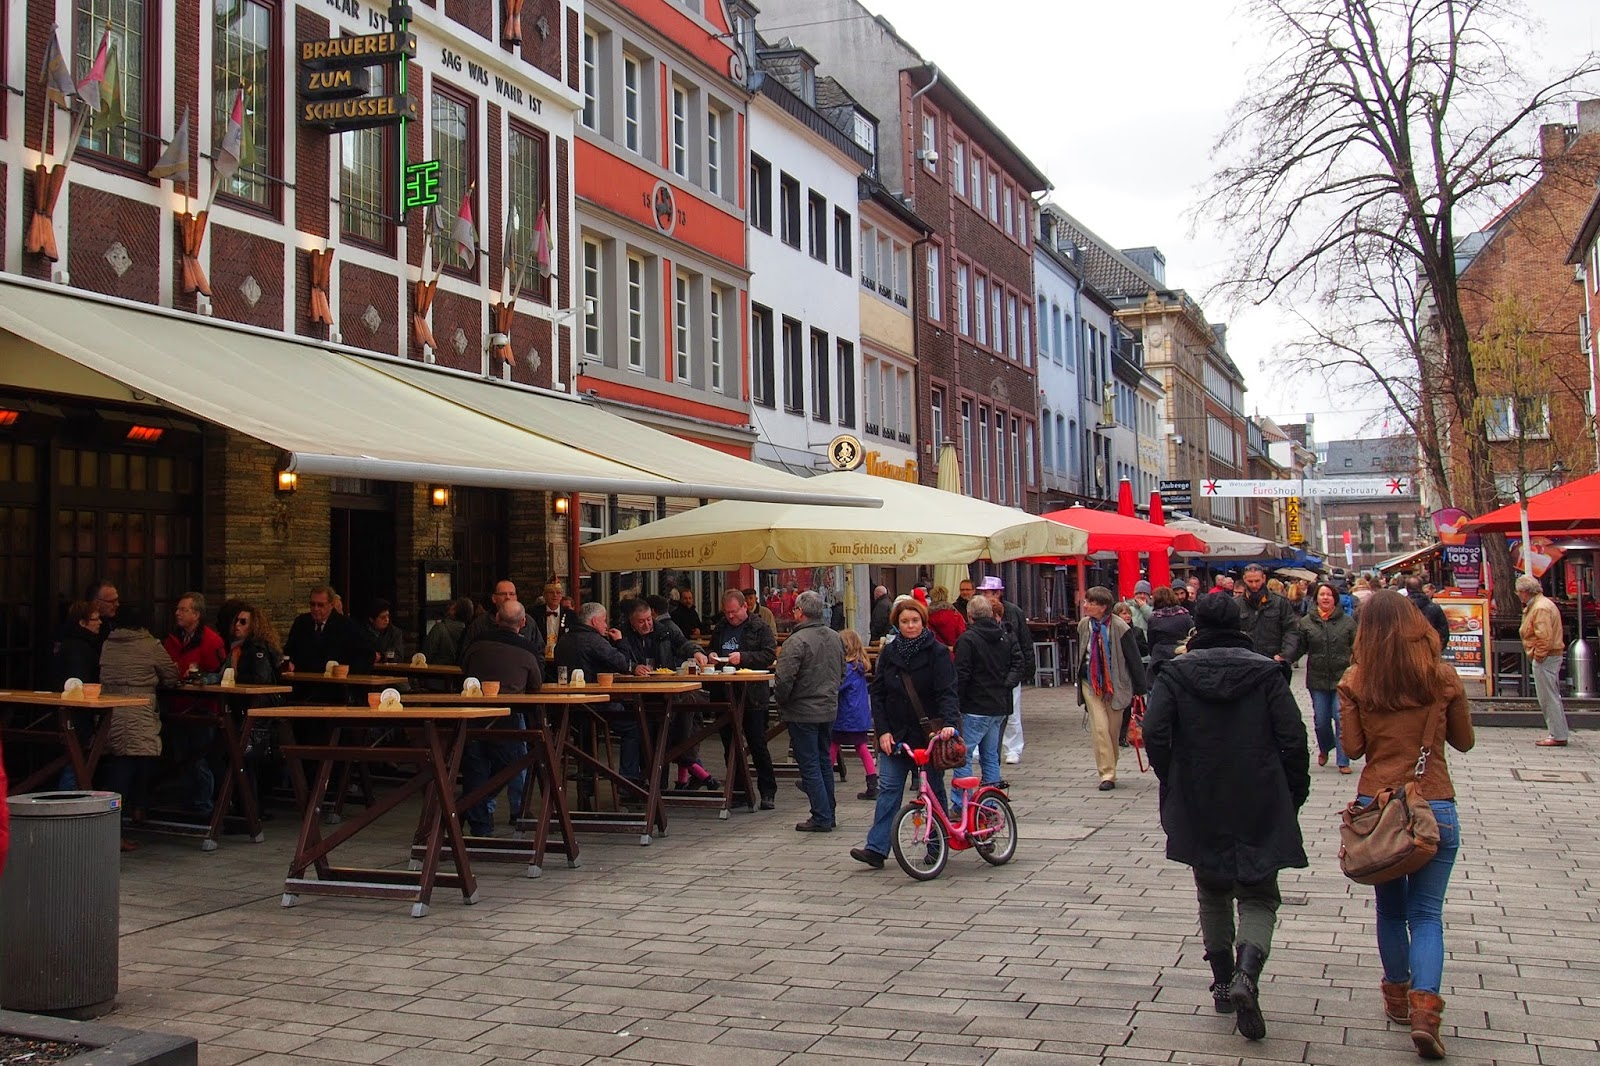 Where is FatBoy ?: Dusseldorf : Altstadt, the old quarter